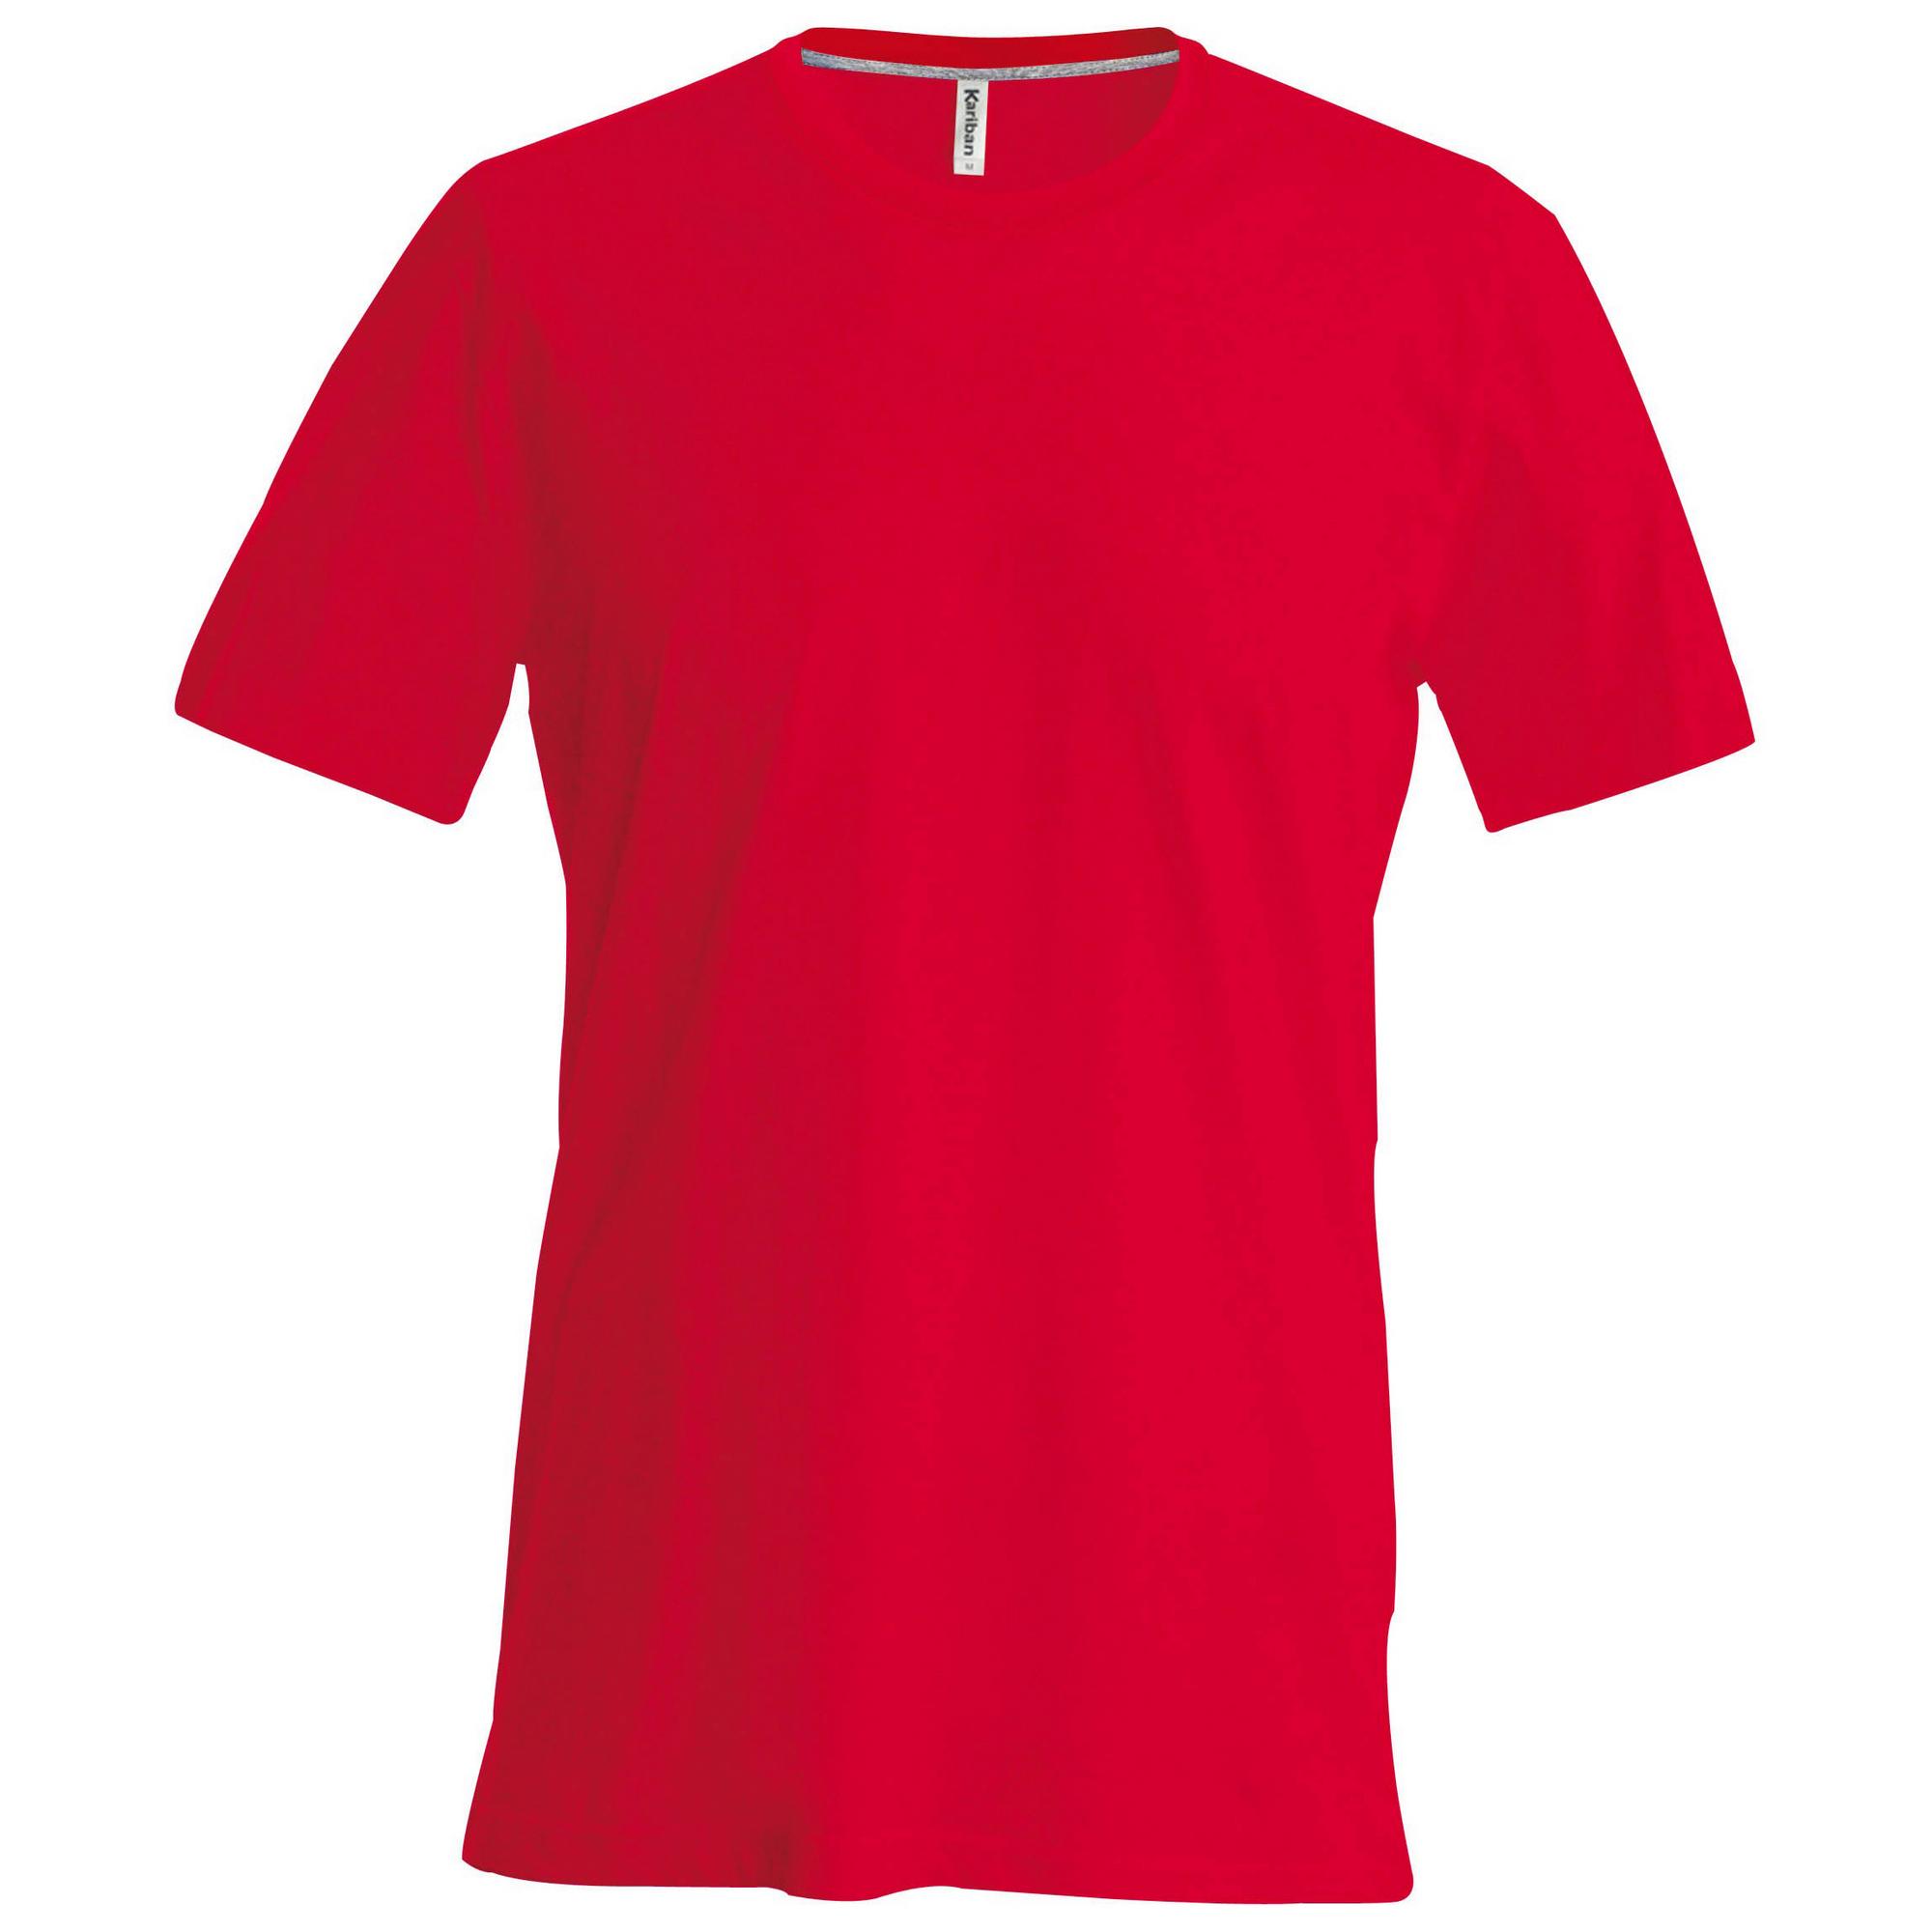 Kariban Mens Slim Fit Short Sleeve Crew Neck T-Shirt (XL) (Red)